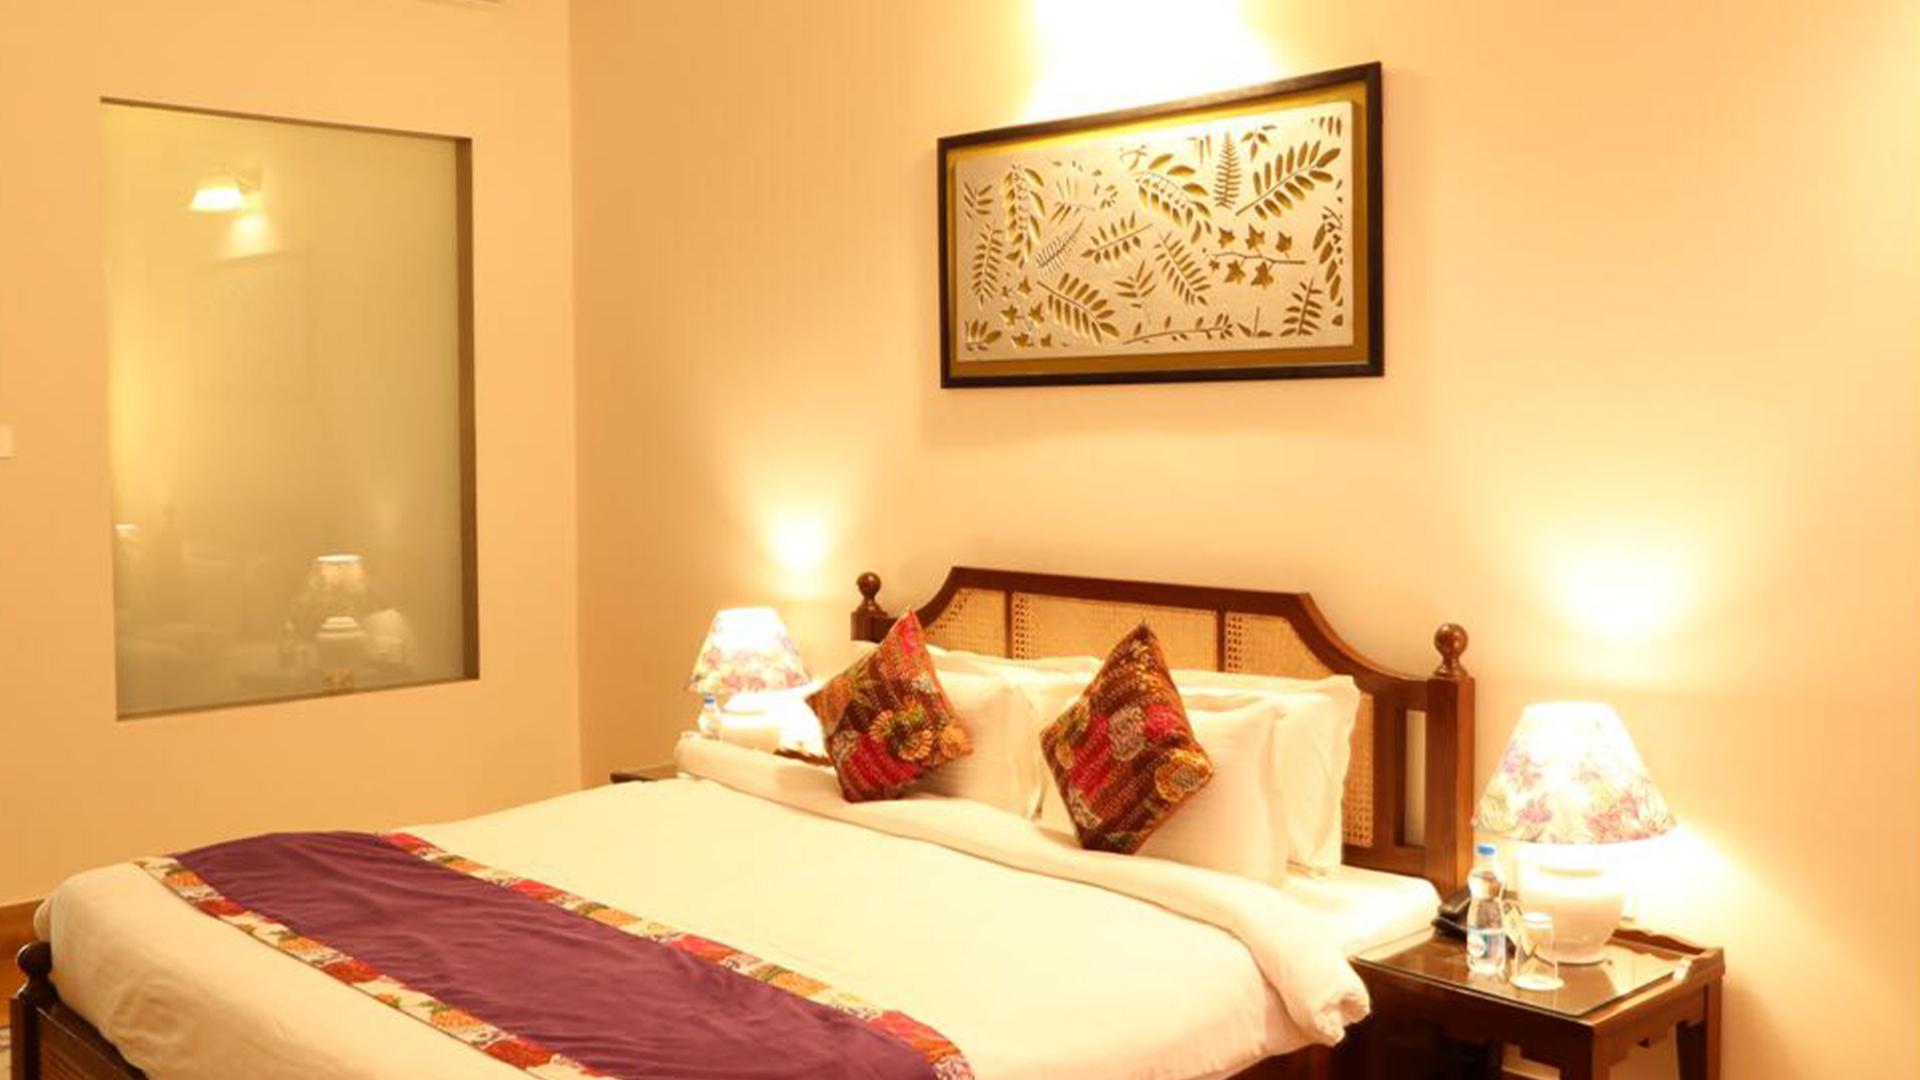 Standard Hideaway Room image 1 at Tree of Life Resort Udaipur OLD by Udaipur, Rajasthan, India